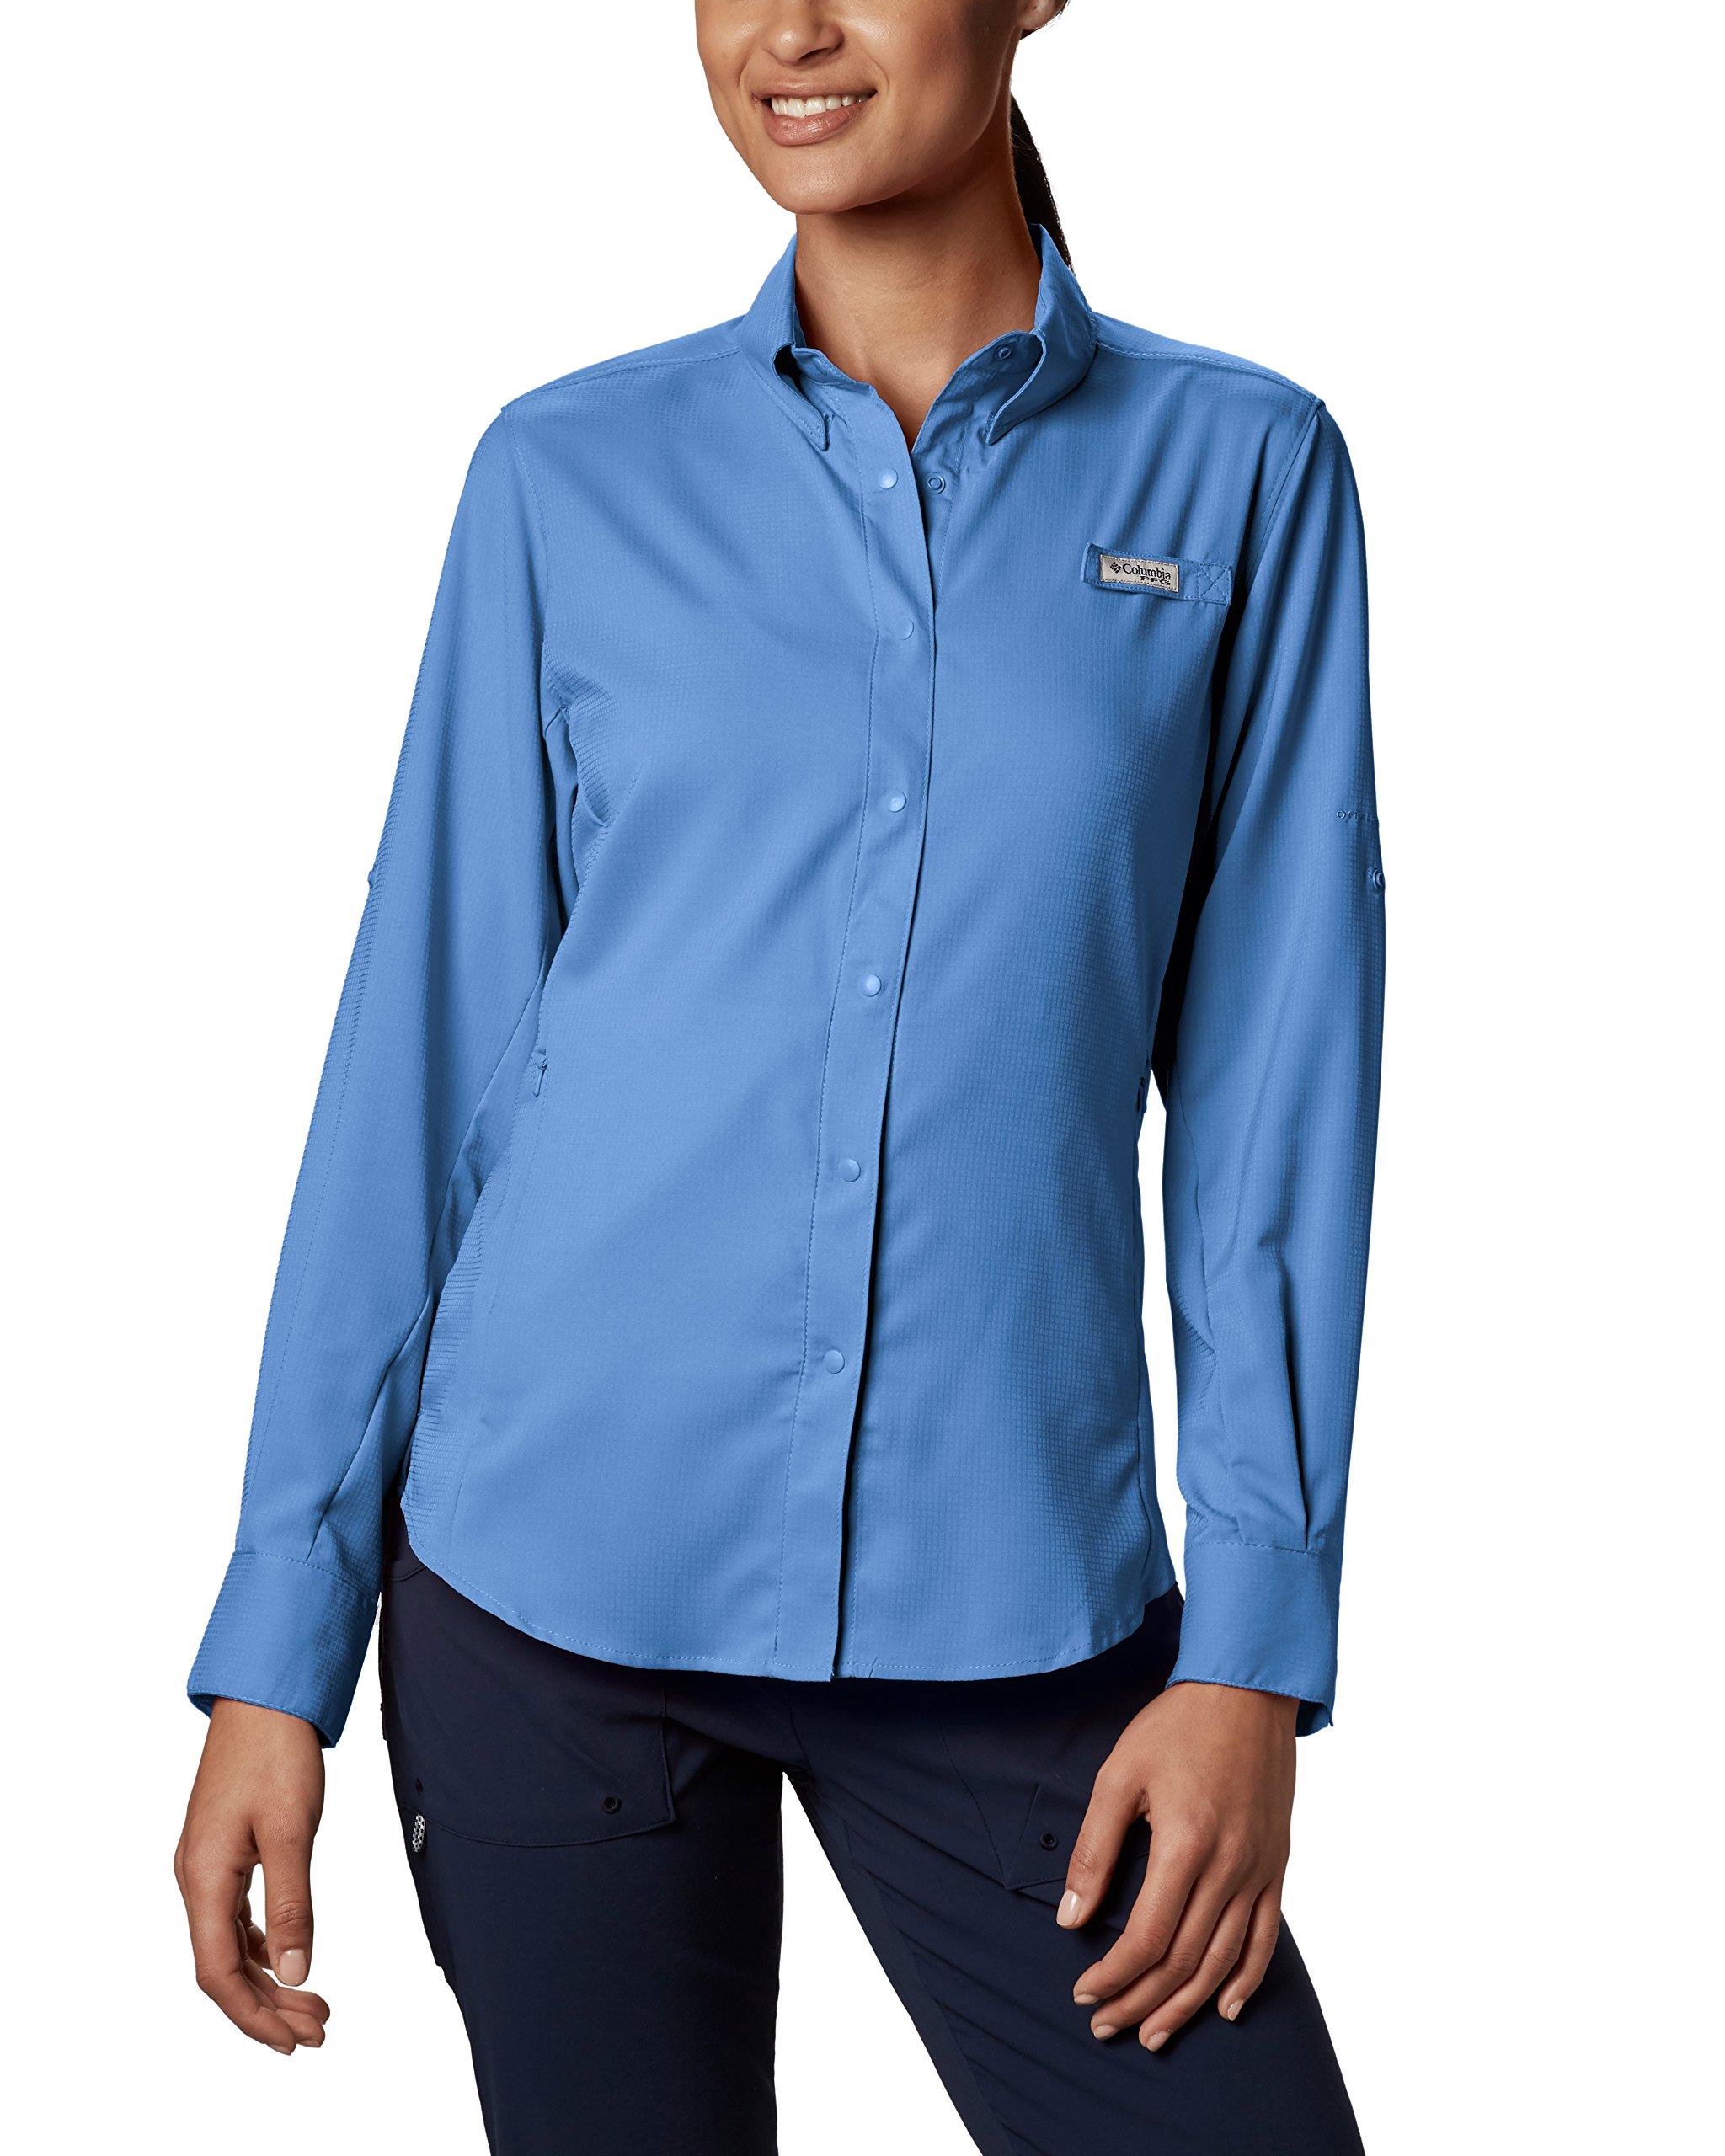 Columbia Women's Tamiami II Long Sleeve Shirt, White Cap(blue), Medium